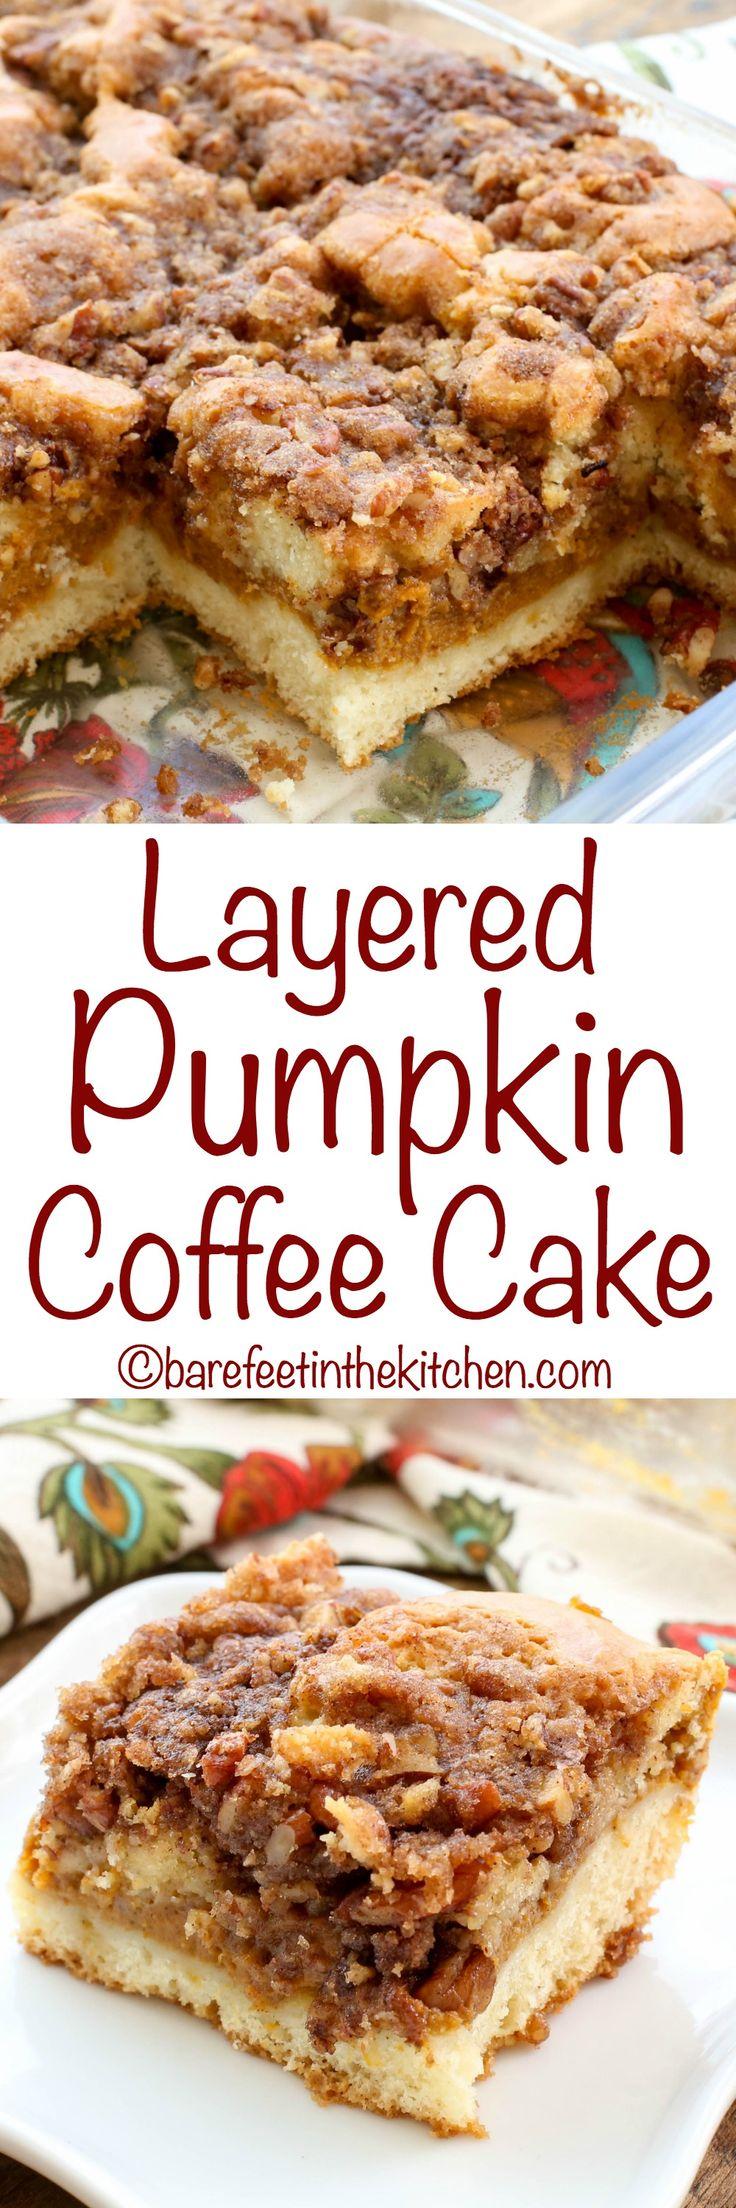 Layered Pumpkin Coffee Cake - get the recipe at barefeetinthekitchen.com